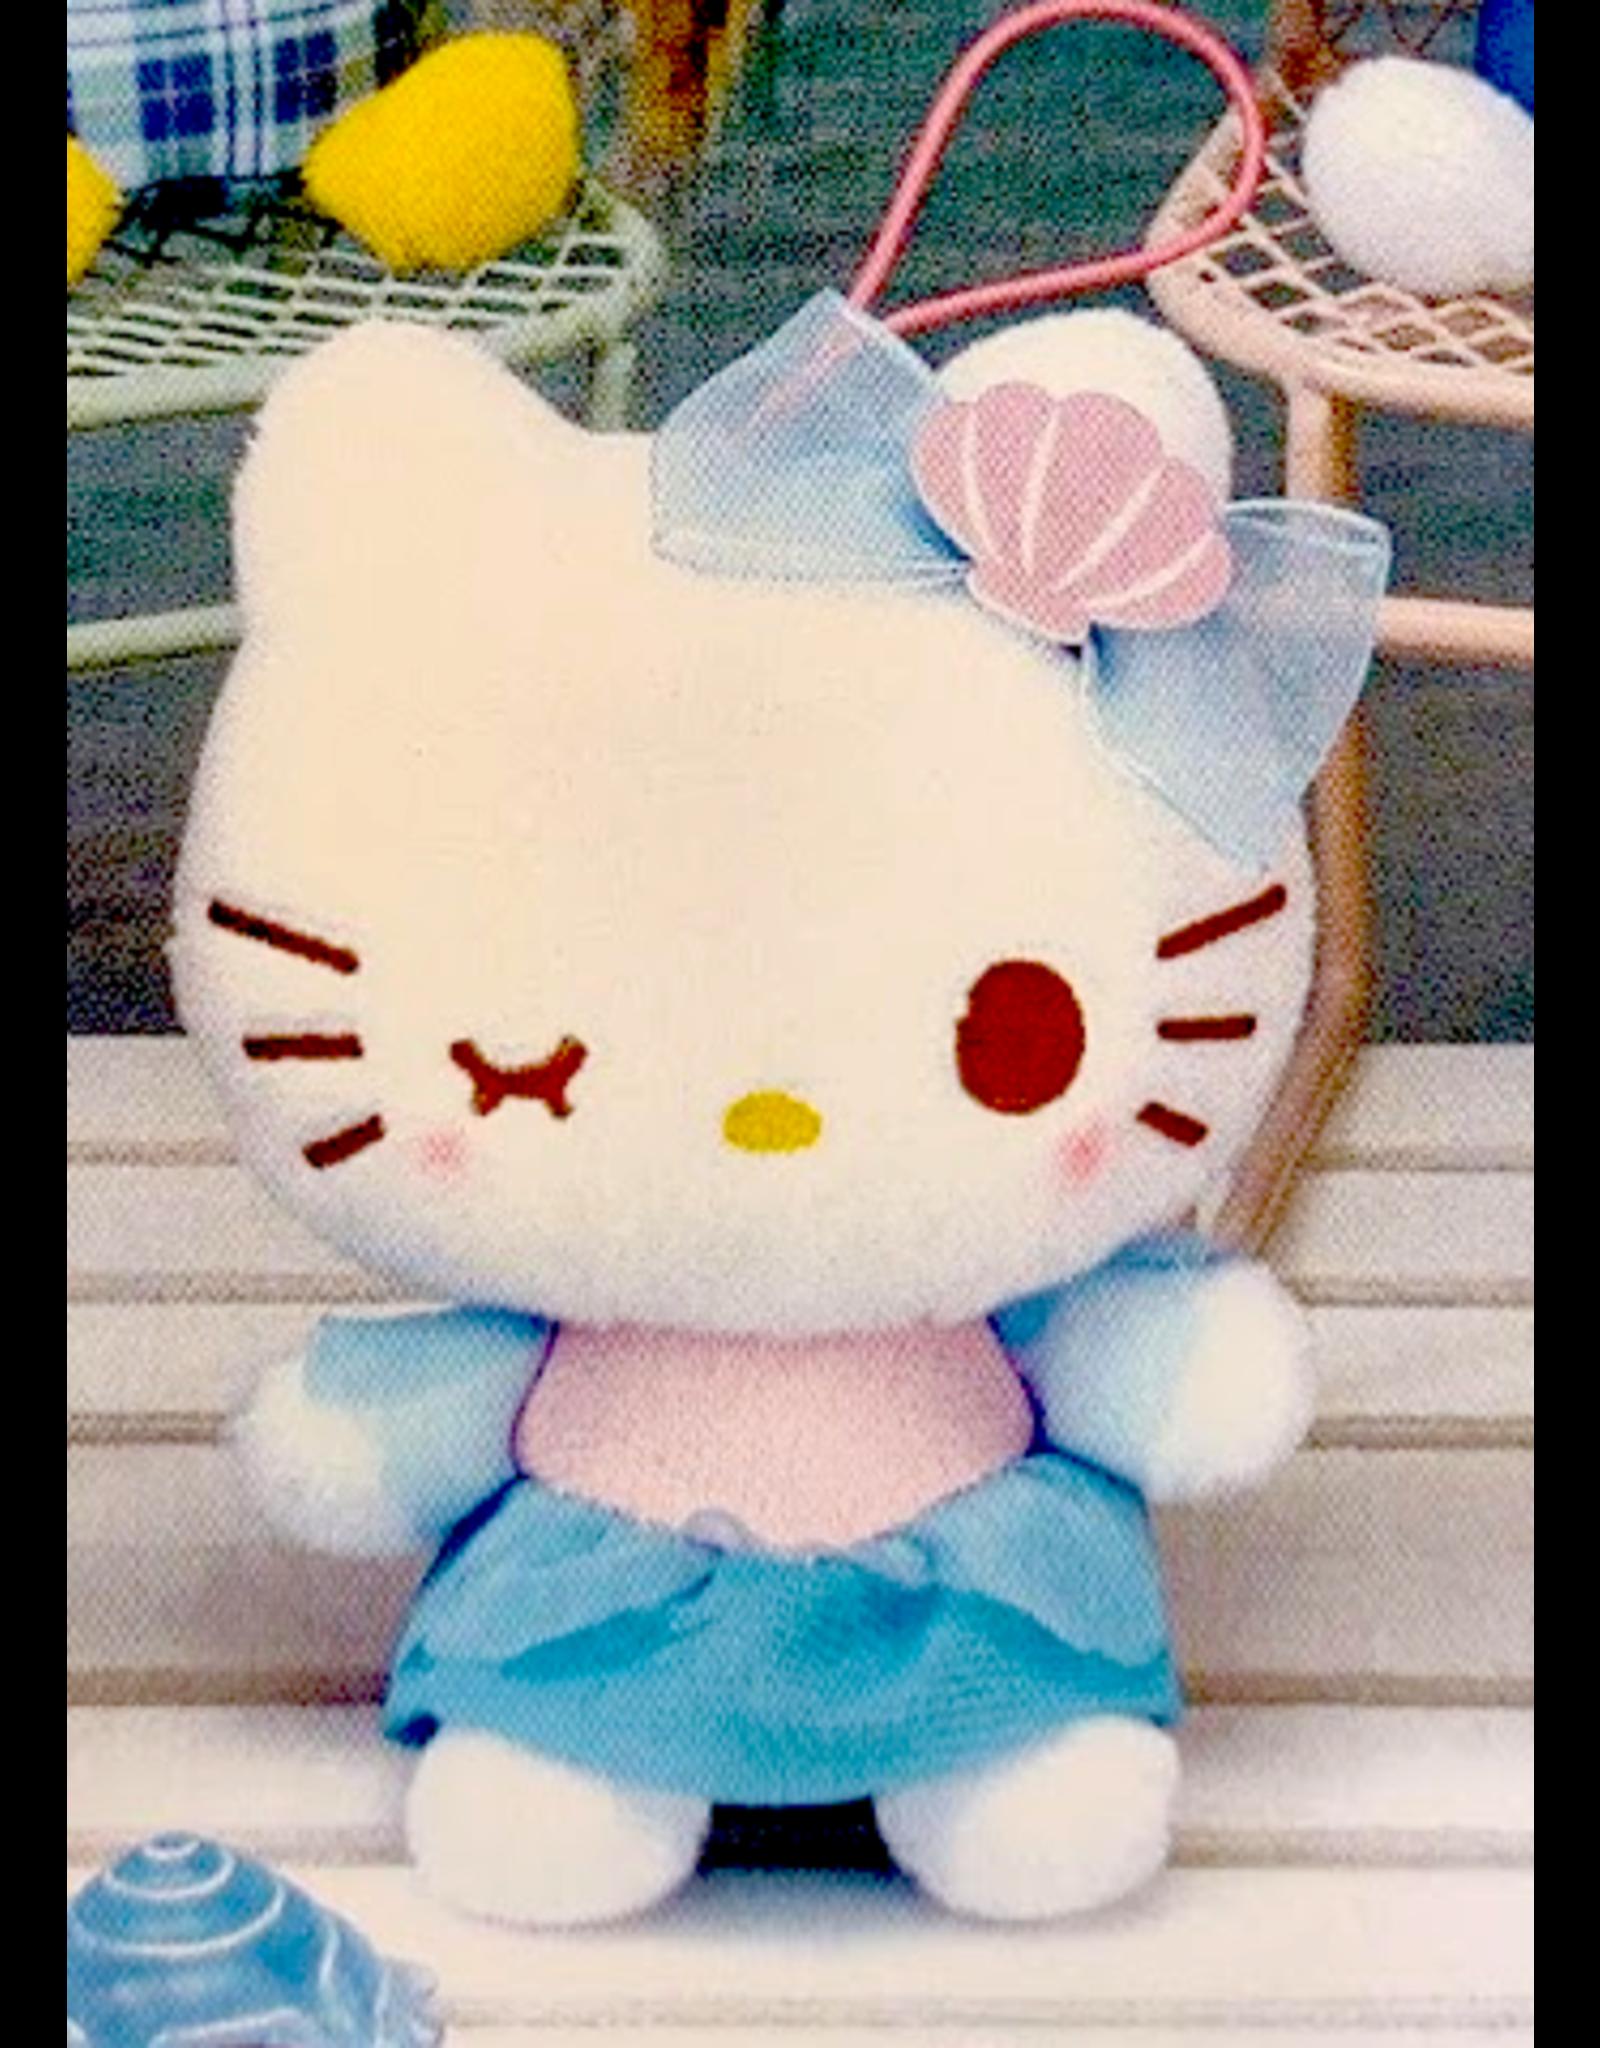 Sanrio Yurukawa Characters Series Mermaid Dress Mascot - Hello Kitty - 10 cm